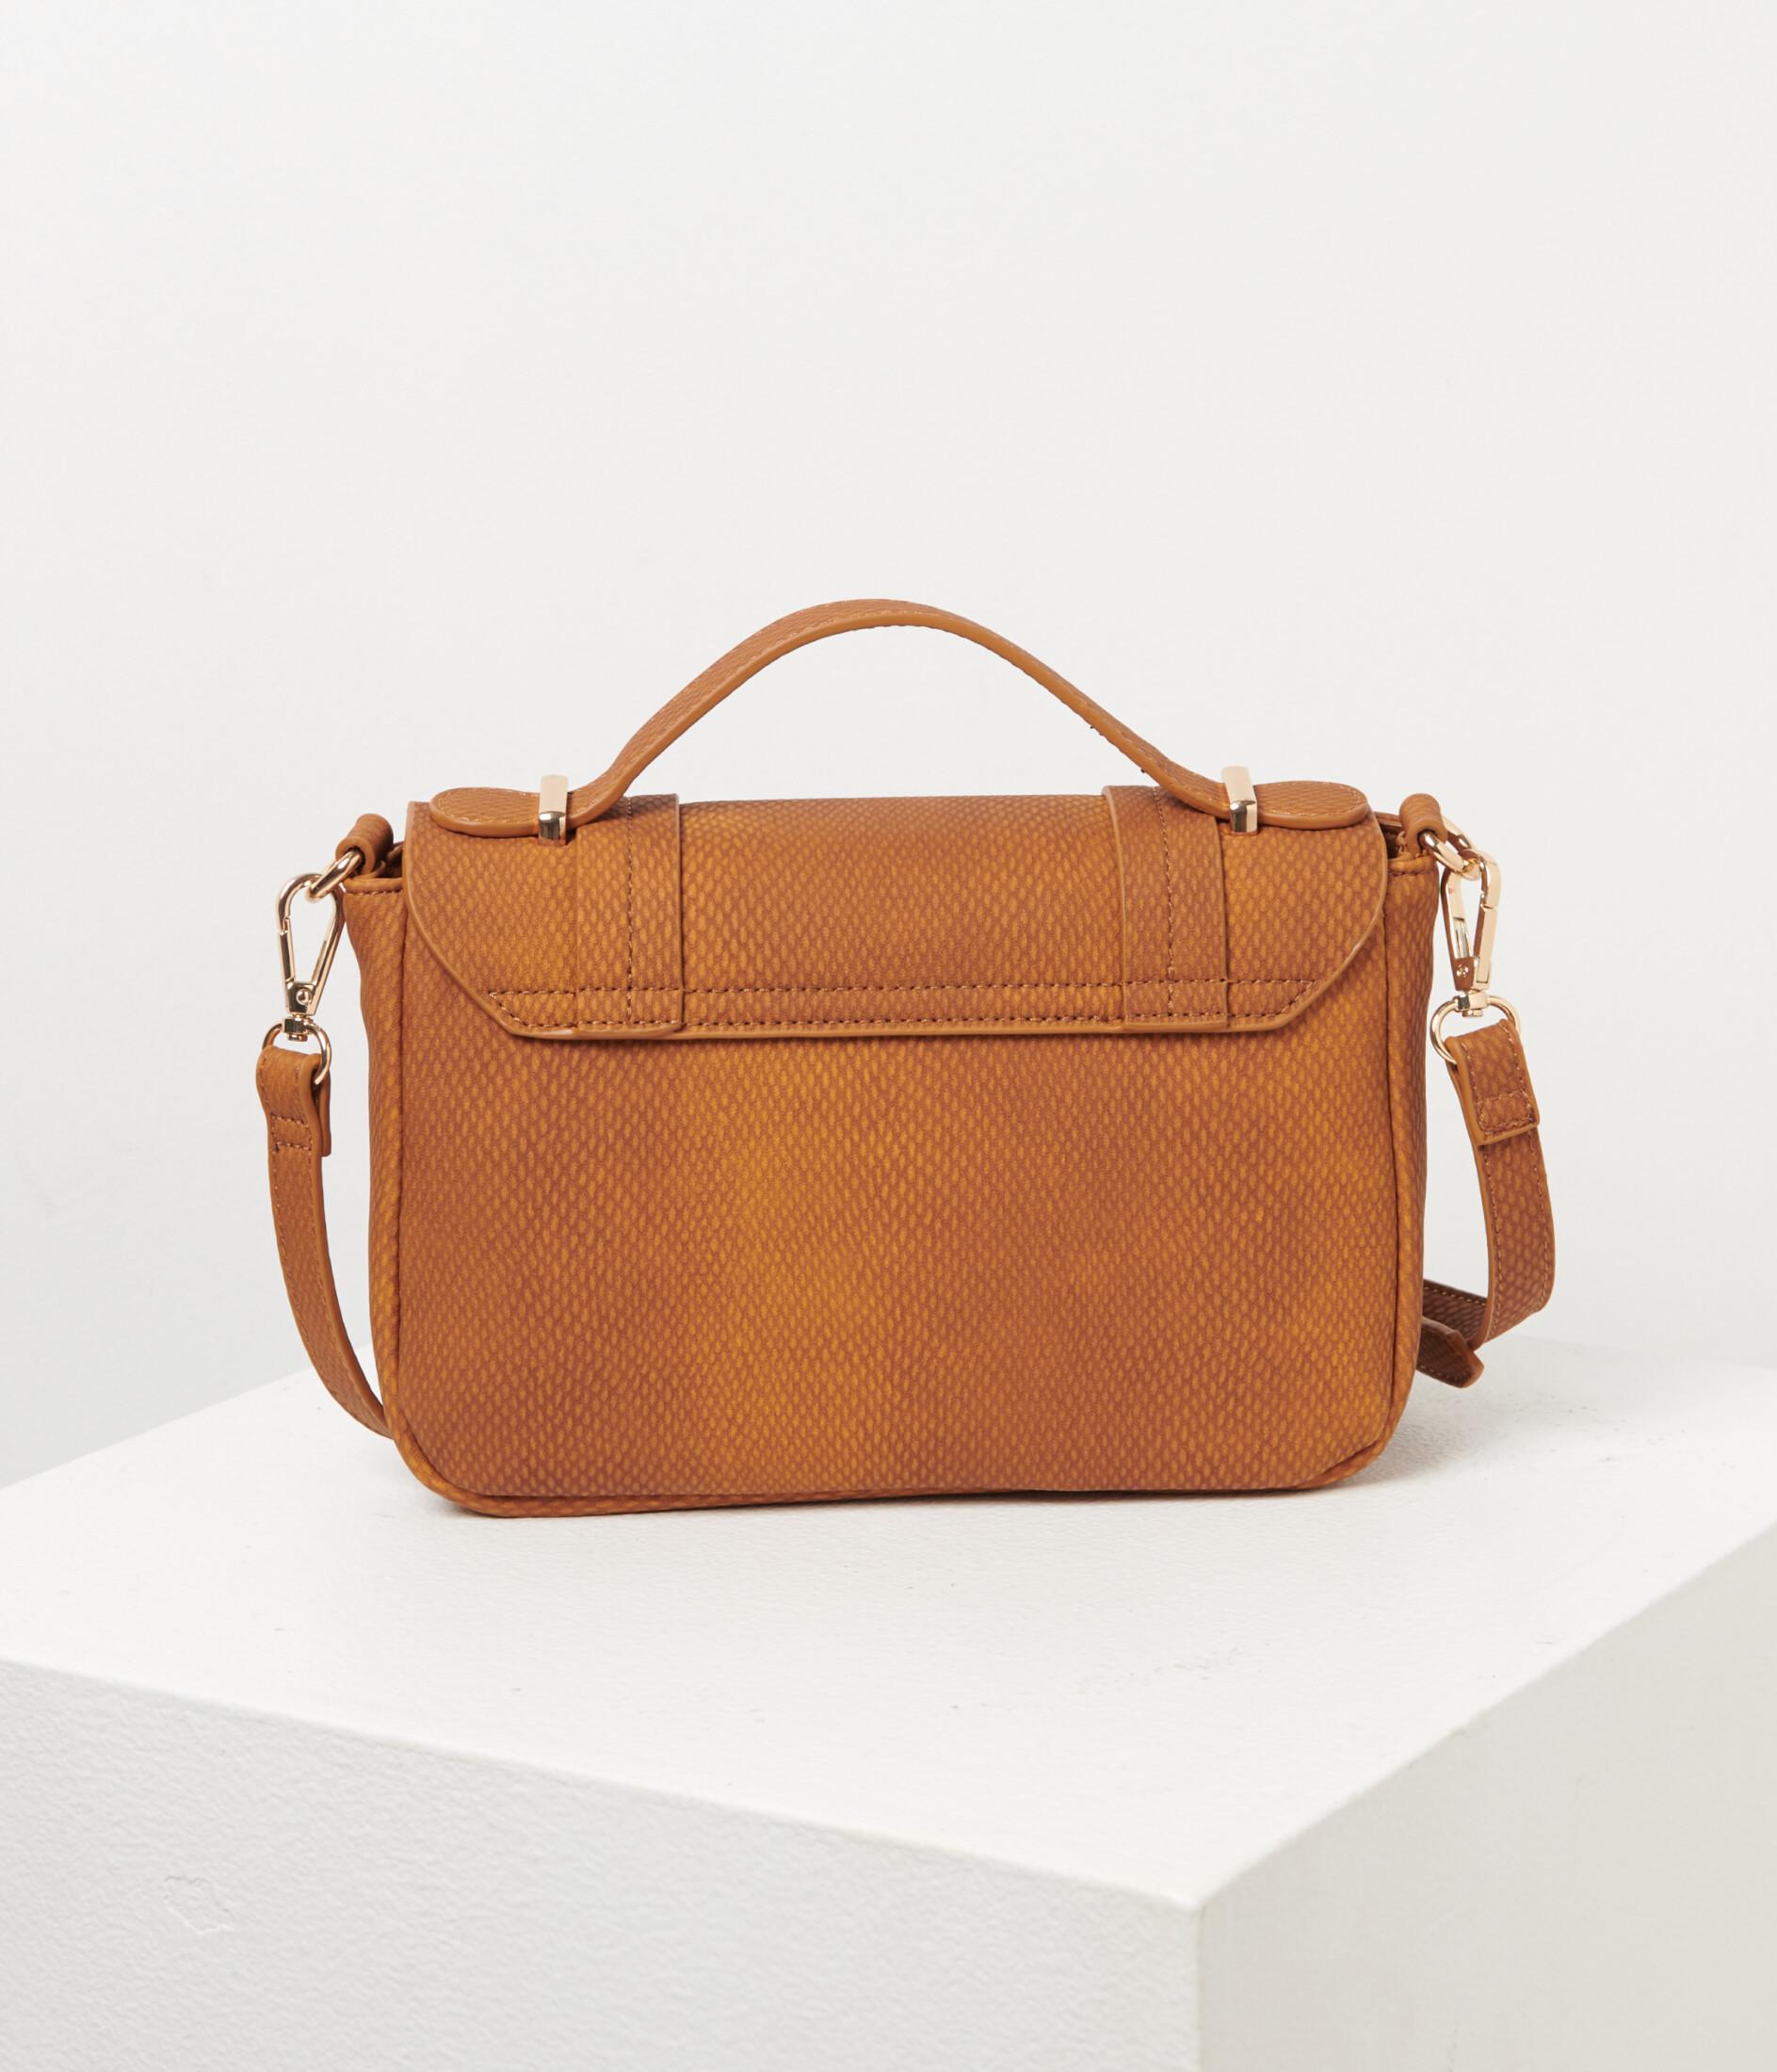 CAMAIEU Ženske torbice rjava